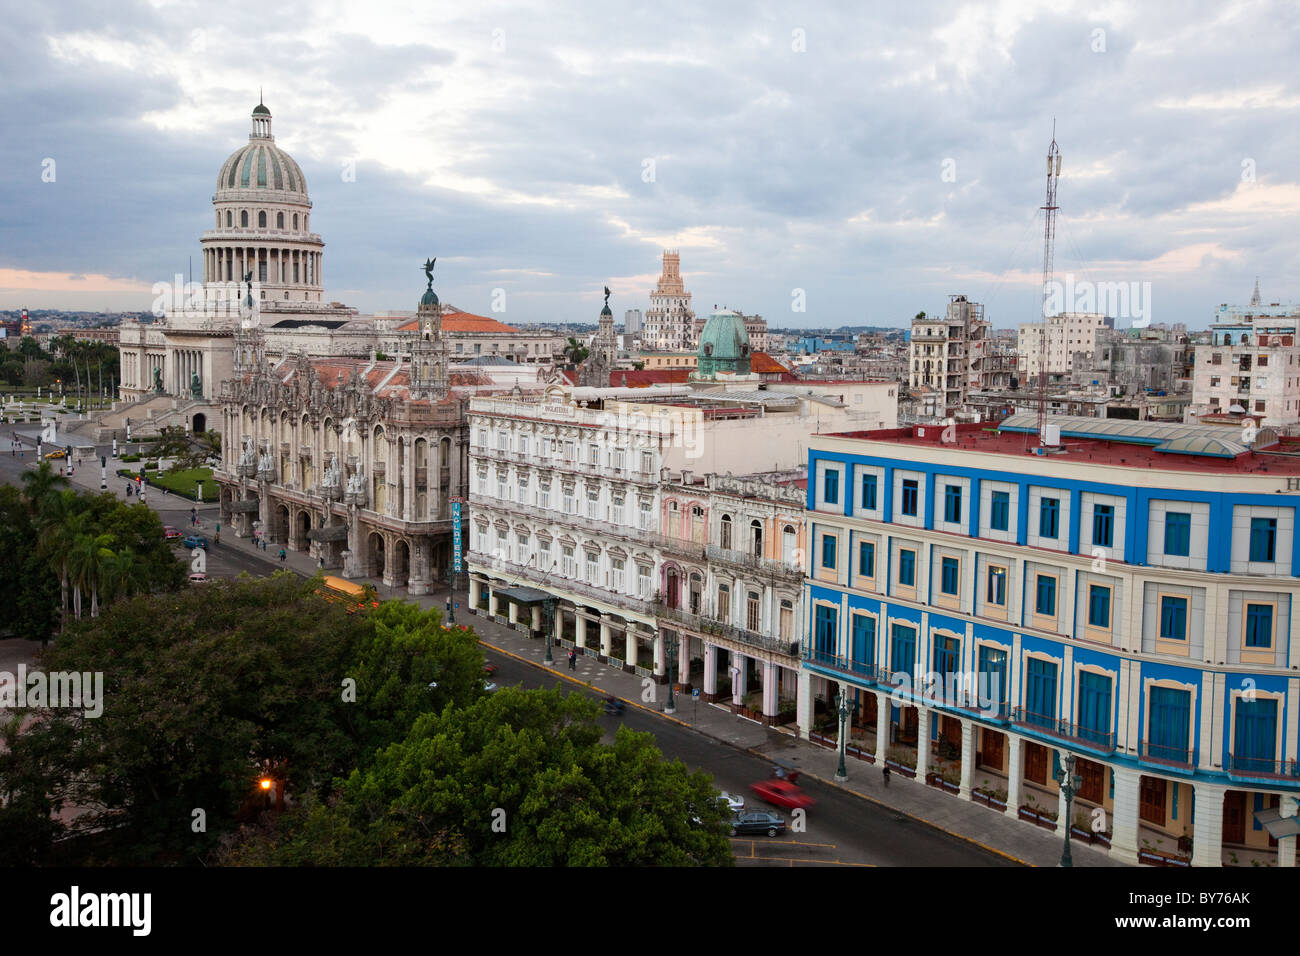 Cuba, Havana. Paseo de Marti. Hotel Telegrafo, Hotel Inglaterra, National Theater, Capitol, from right foreground - Stock Image